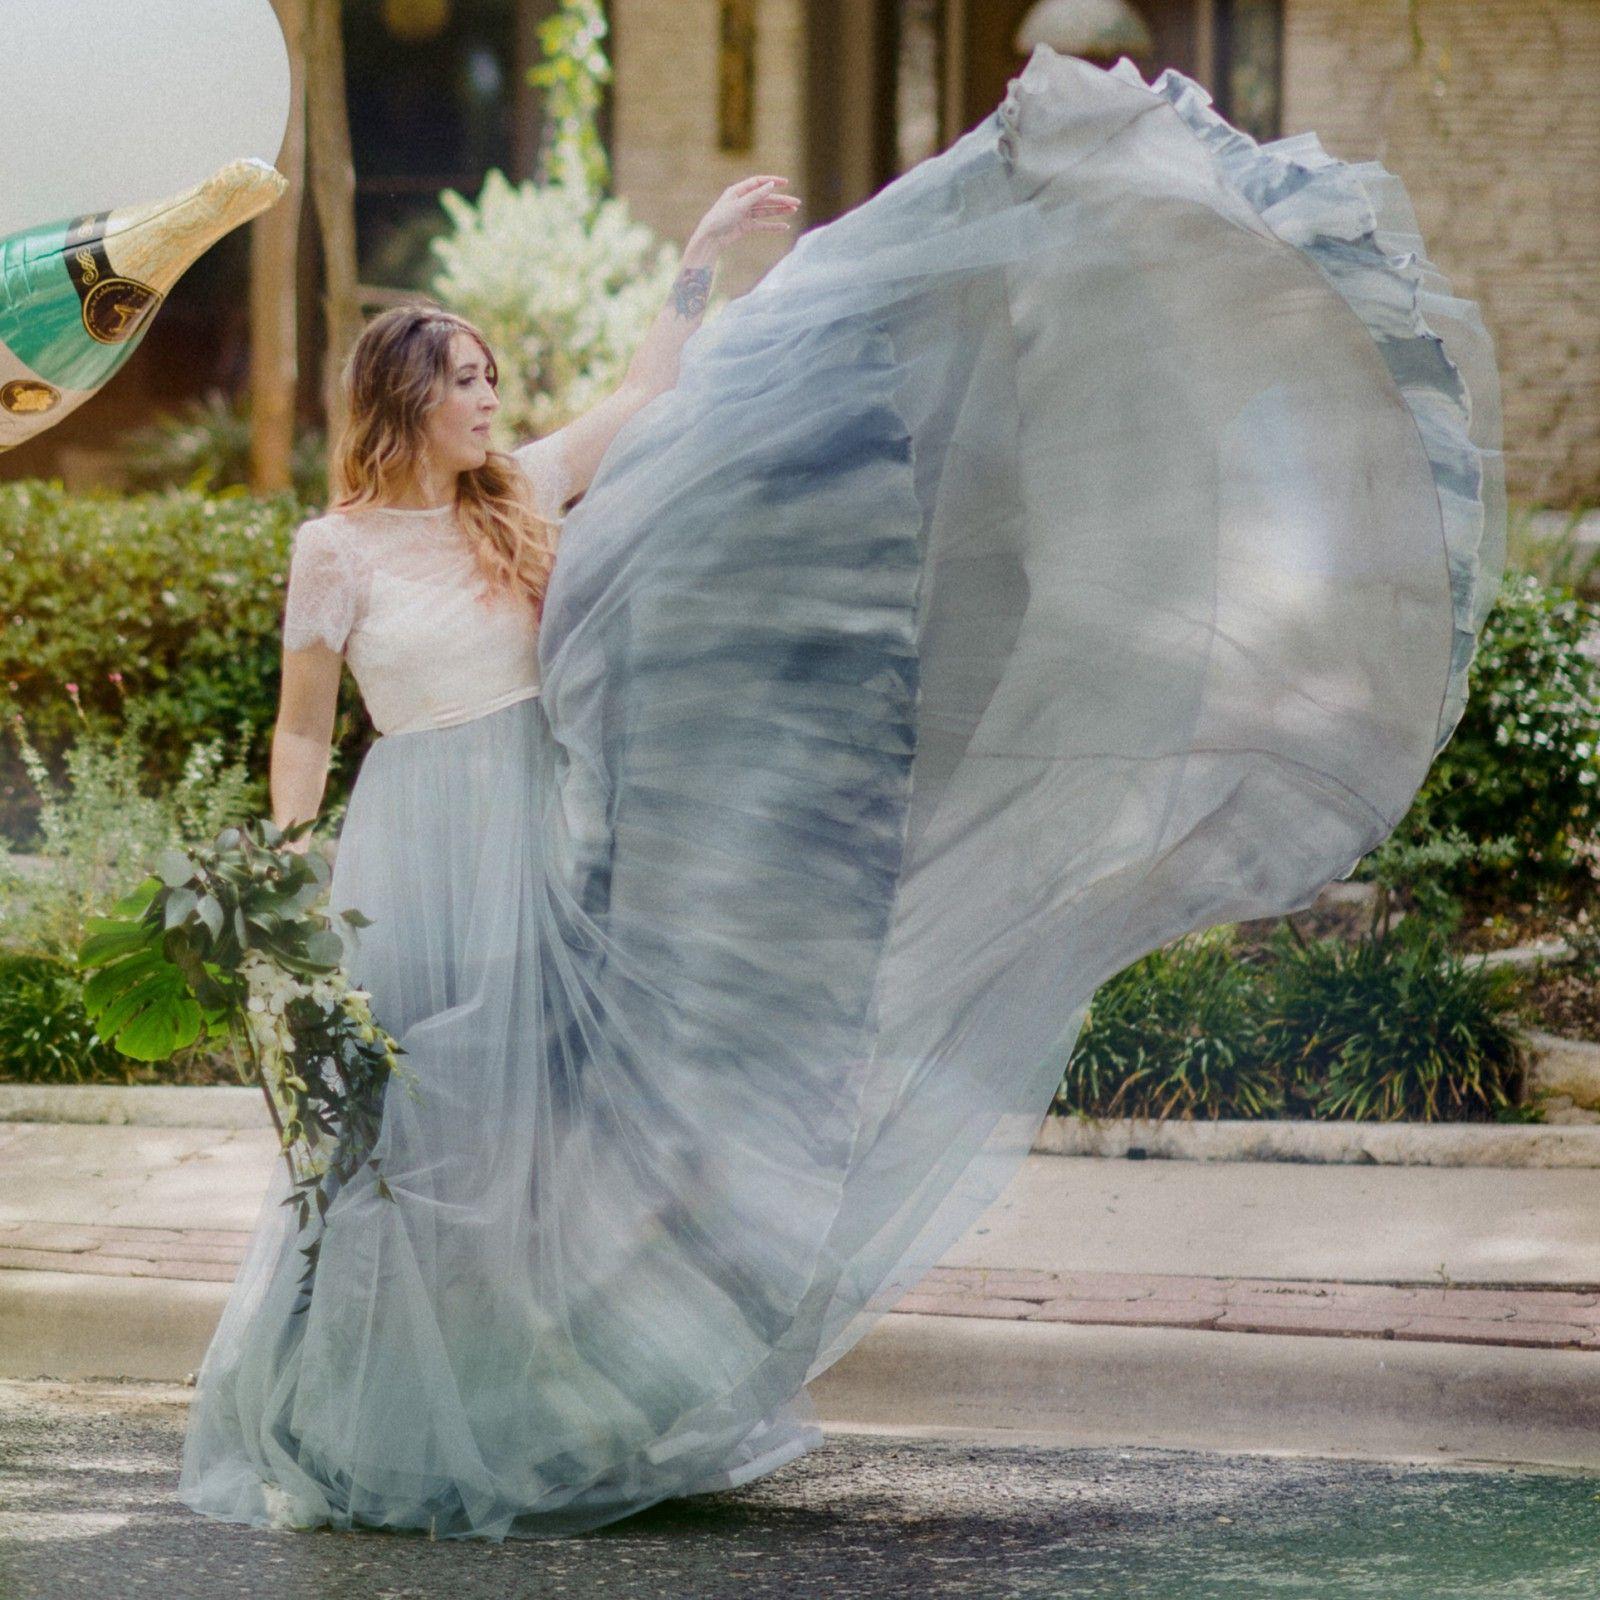 Chantel Lauren Mae Preowned Wedding Dress Preowned Wedding Dresses Colored Wedding Dresses Used Wedding Dresses